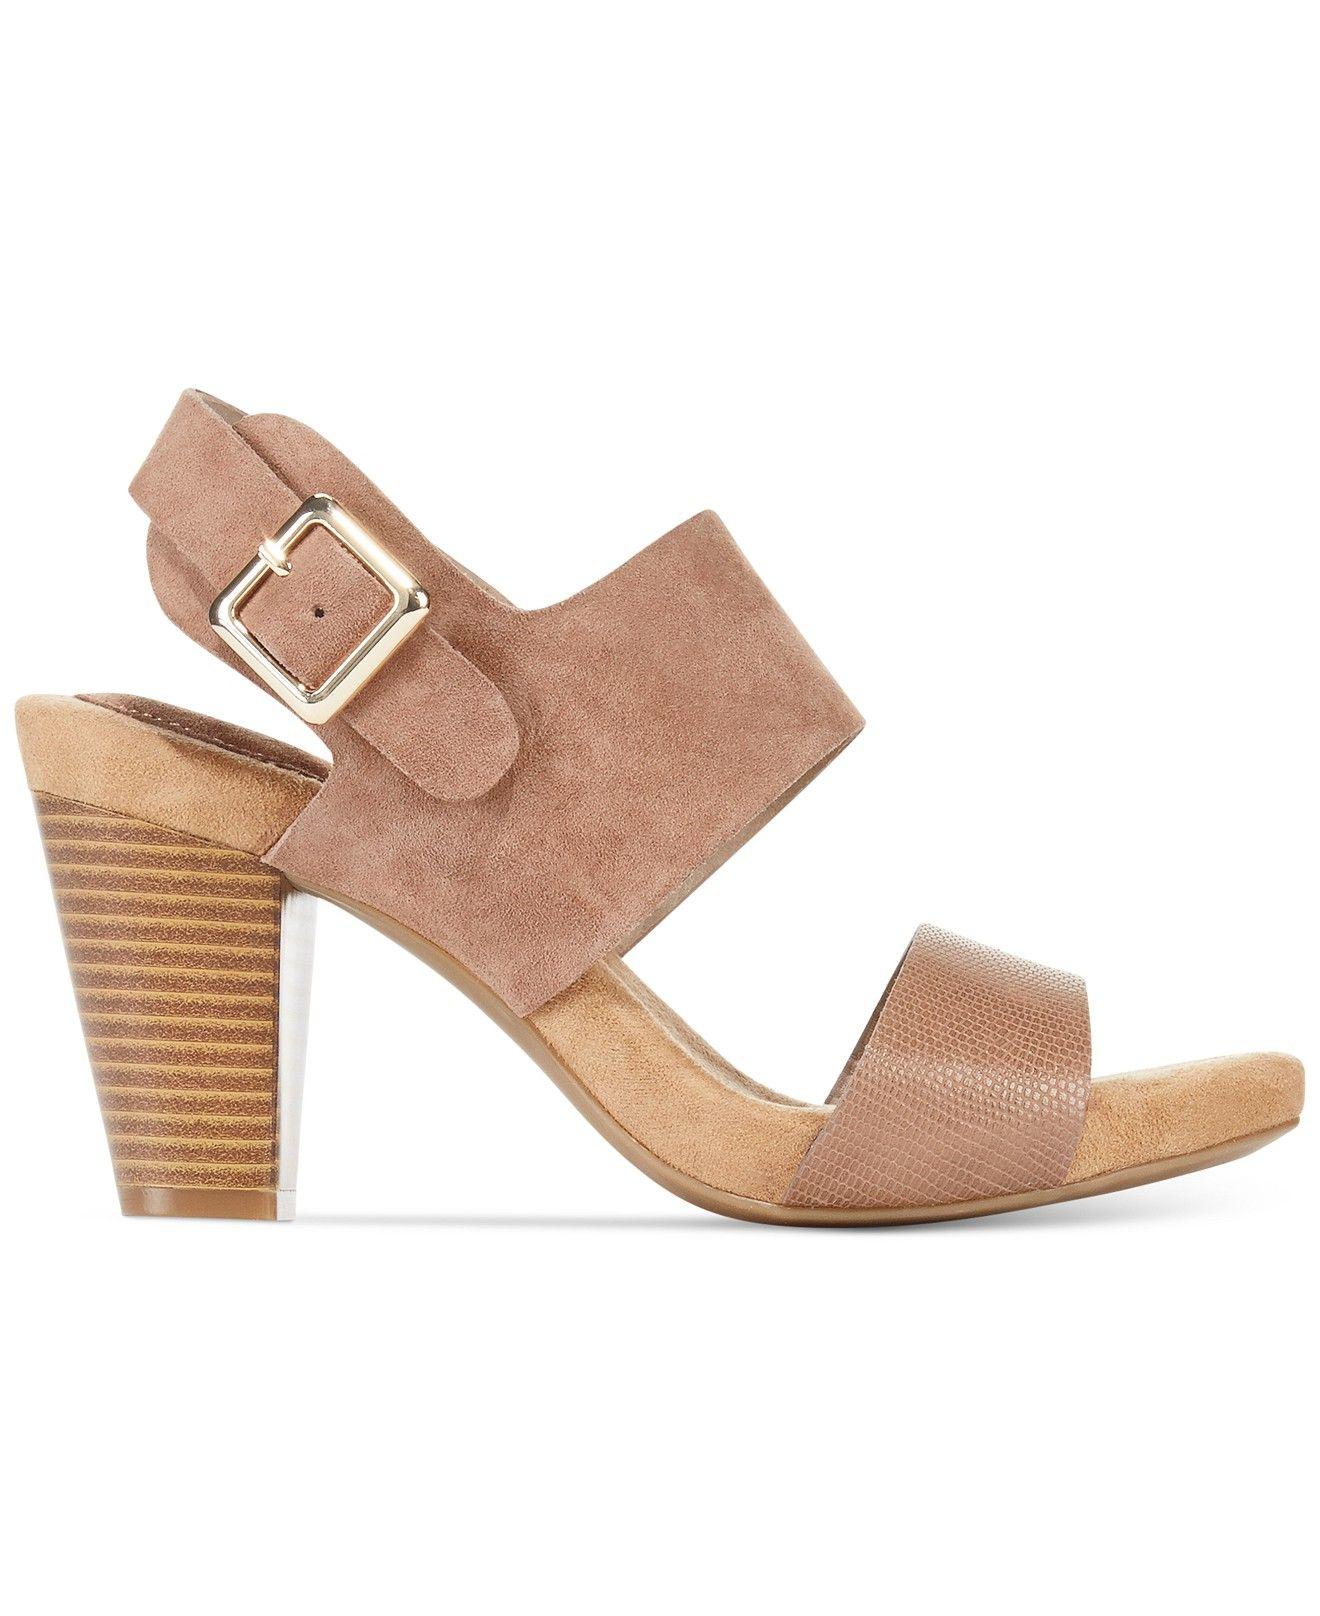 Giani Bernini Aikko Platform Dress Sandals All Women S Shoes Shoes Macy S Dress Sandals Sandal Online Shoes Sandals